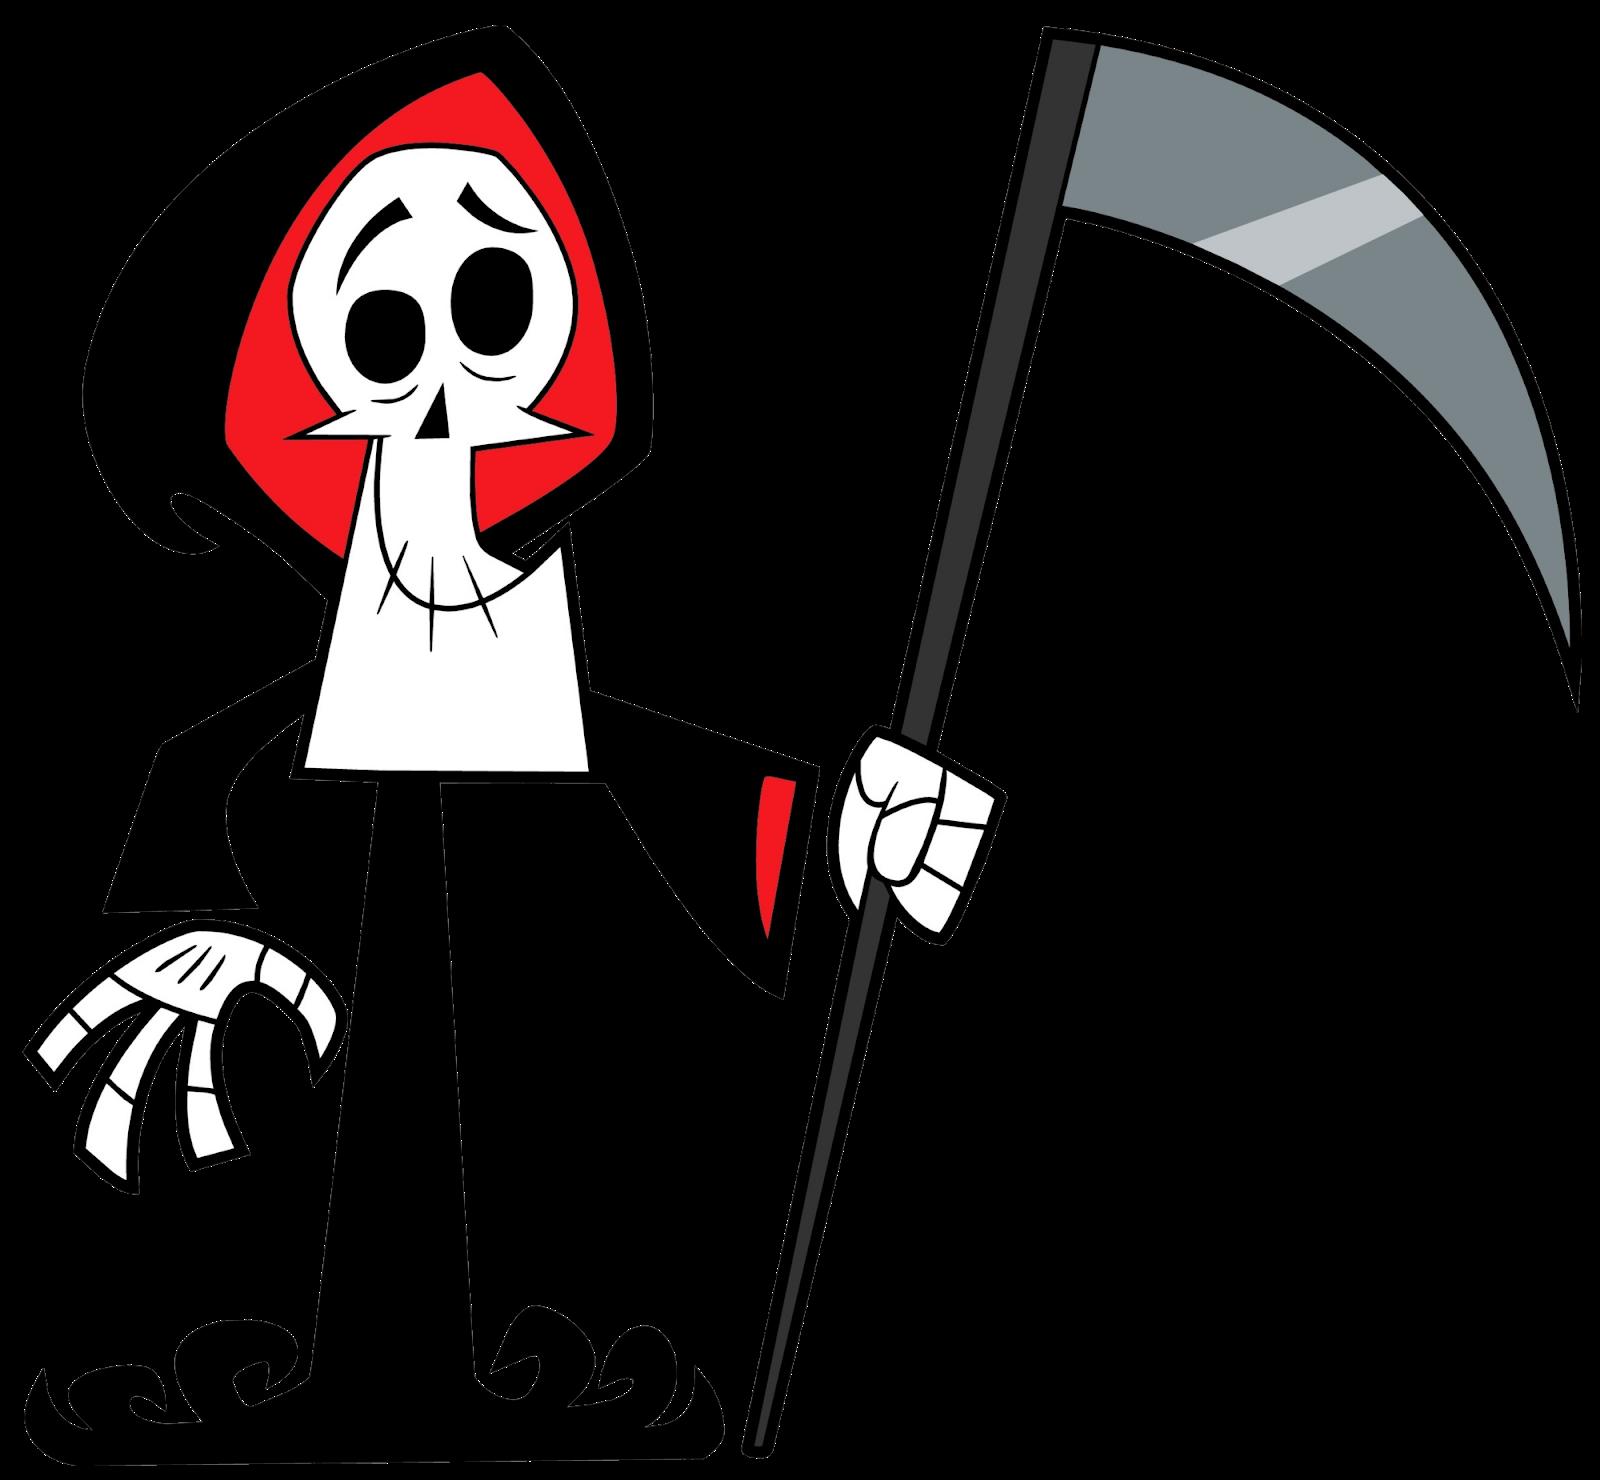 jpg library stock Grim reaper clipart bone. Thankswalot blogs analysis the